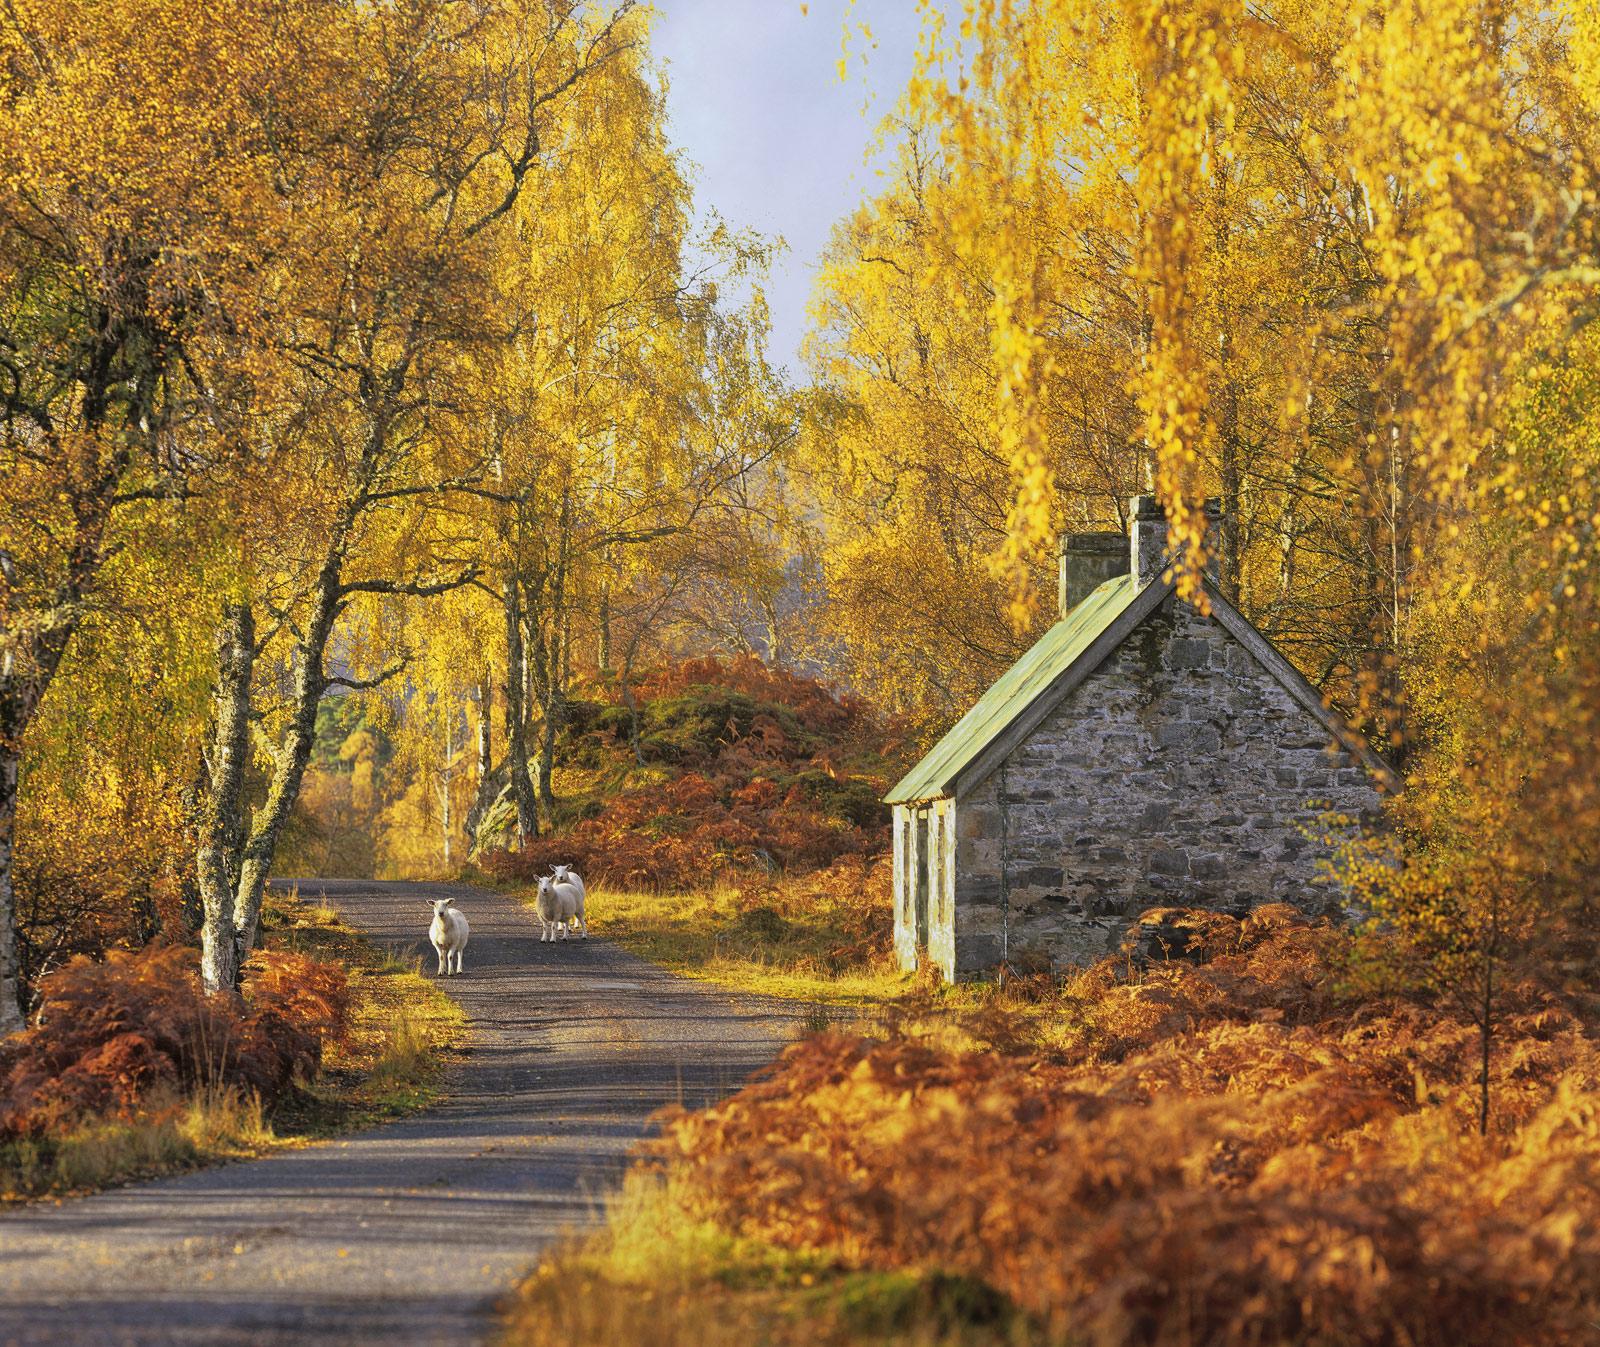 Wary Travellers, Strathfarrar, Highlands, Scotland, autumnal, birch, russet, golden, sheep, three, idyllic, photo